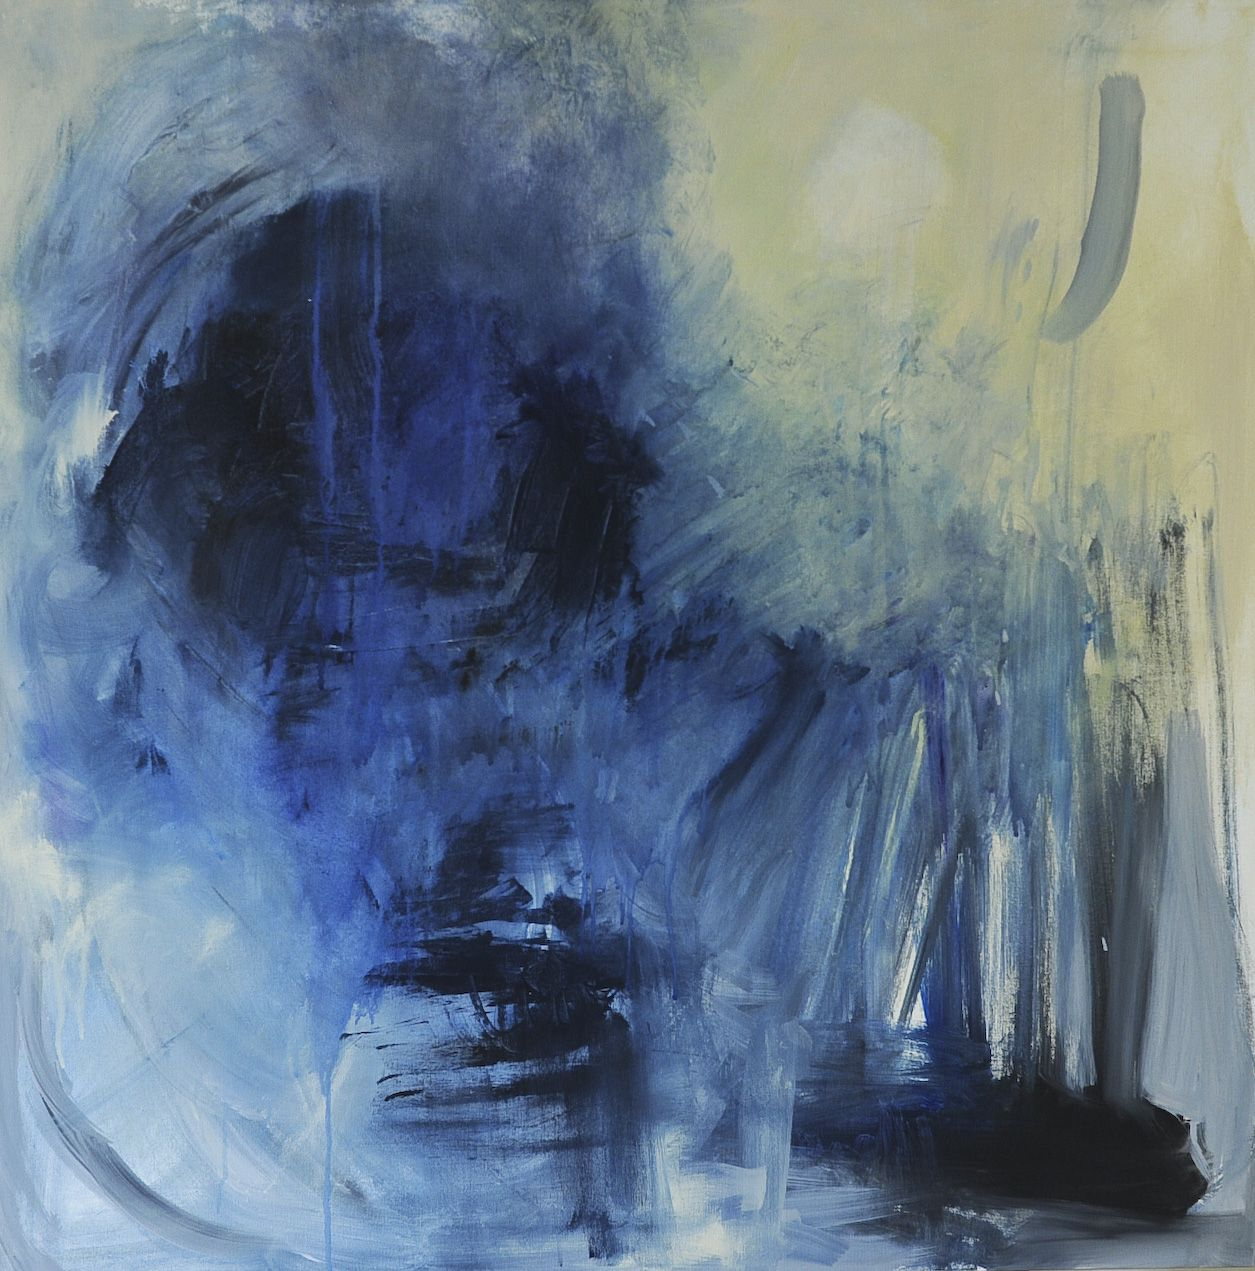 Pin by Nikko Miladinovich - Abstract on Art | Abstract art